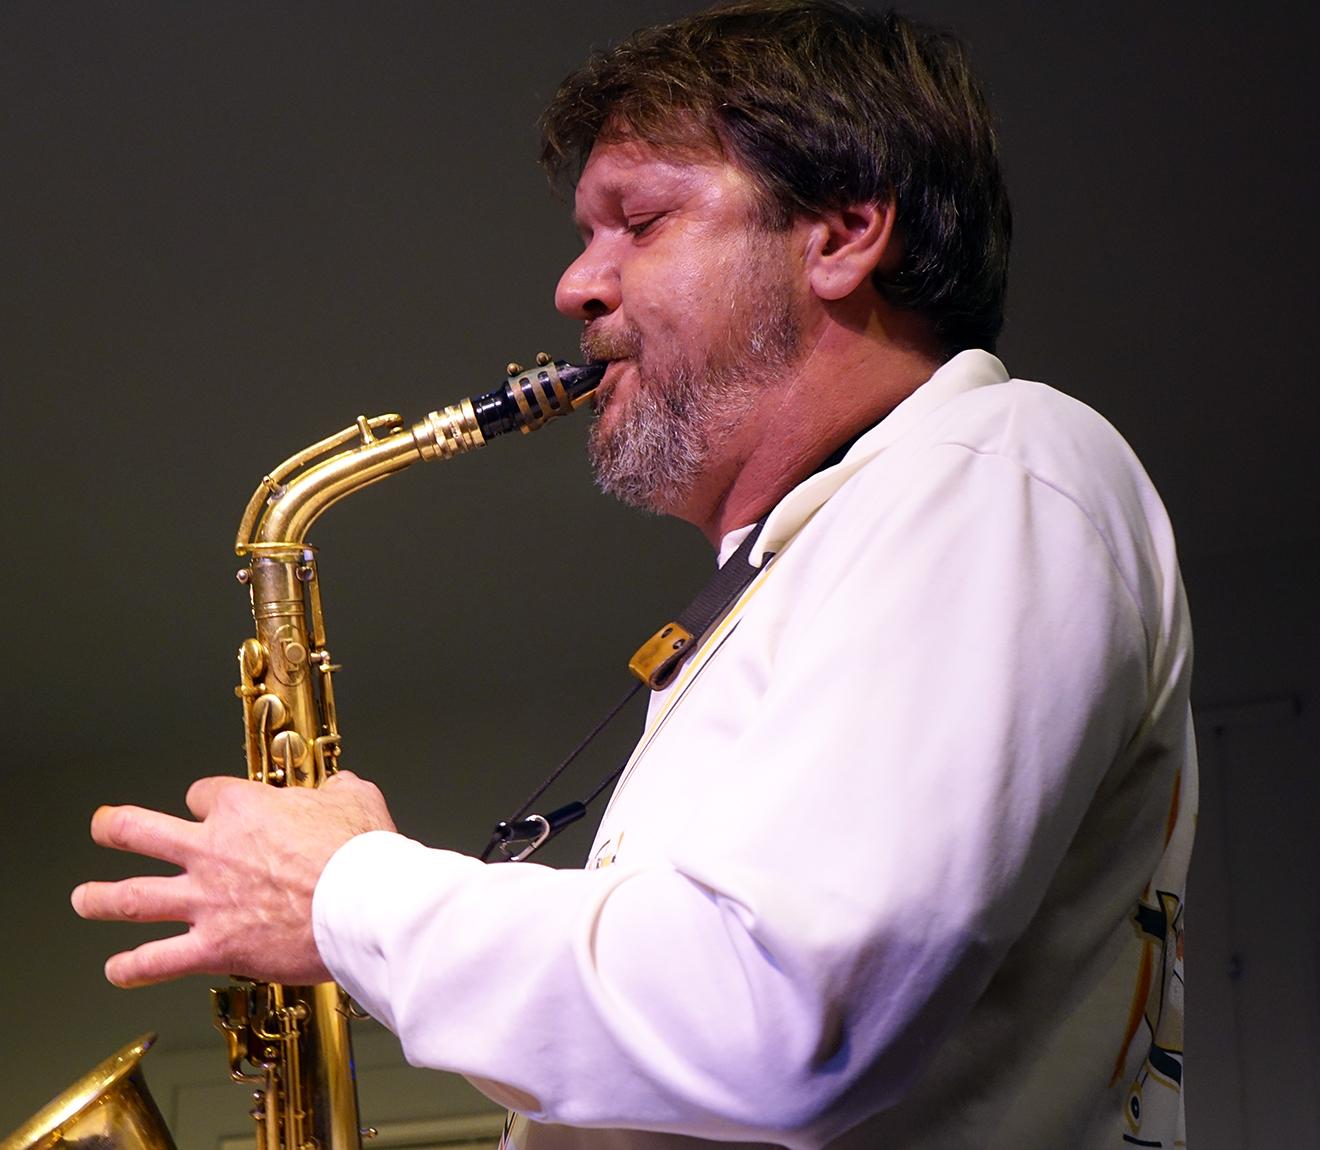 Jim Hobbs at Edgefest 2015